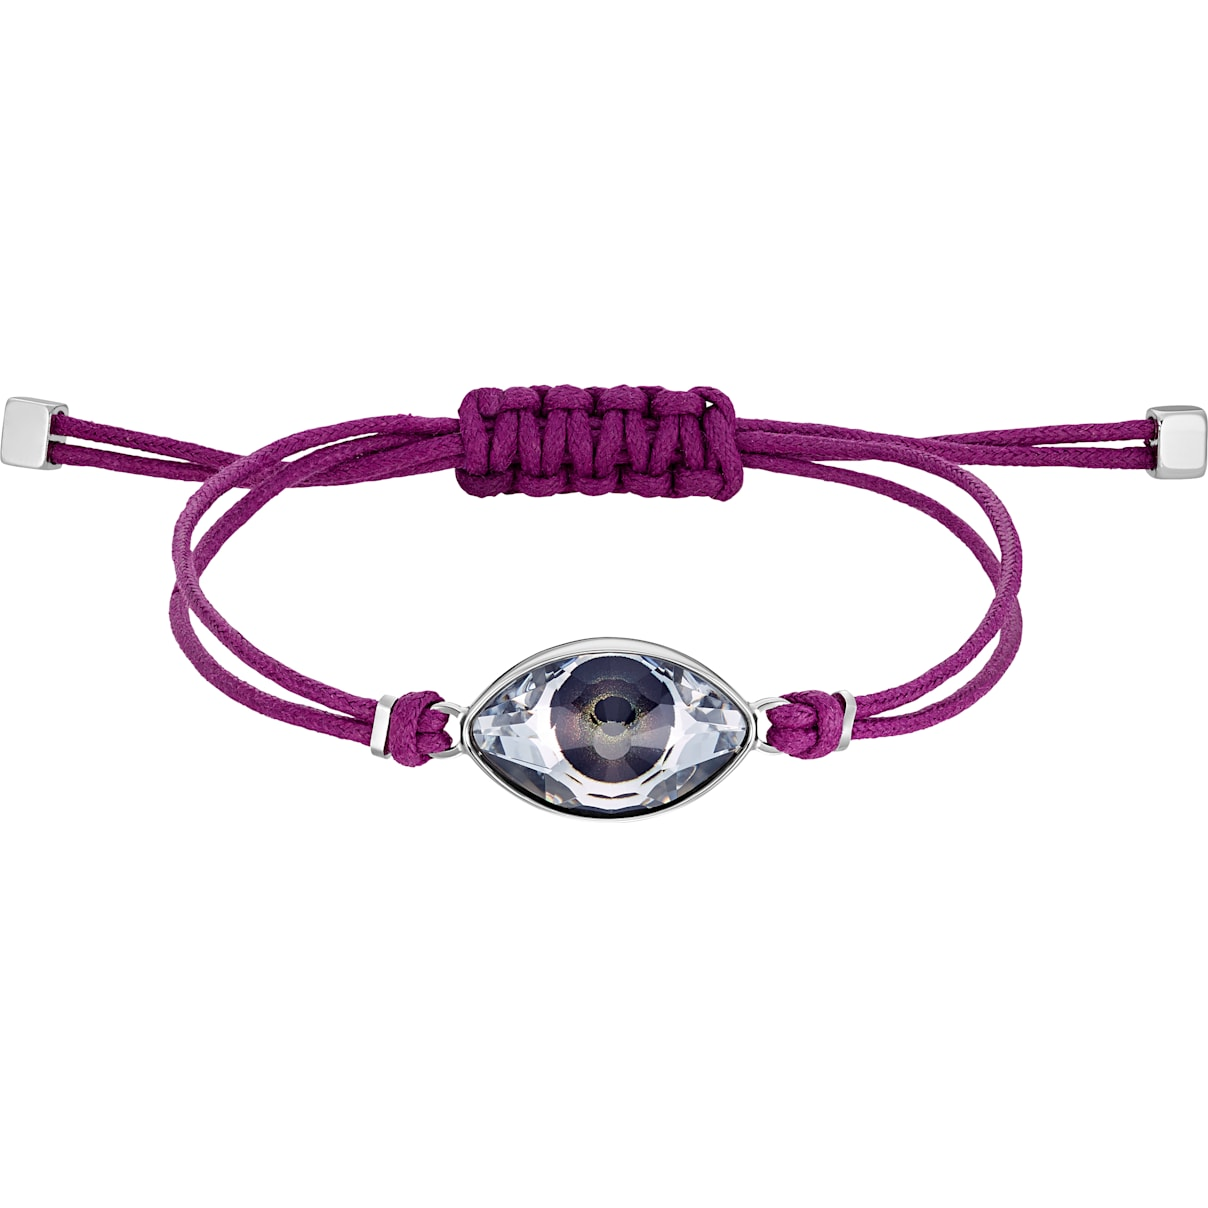 Swarovski Swarovski Power Collection Evil Eye Bracelet, Purple, Stainless steel